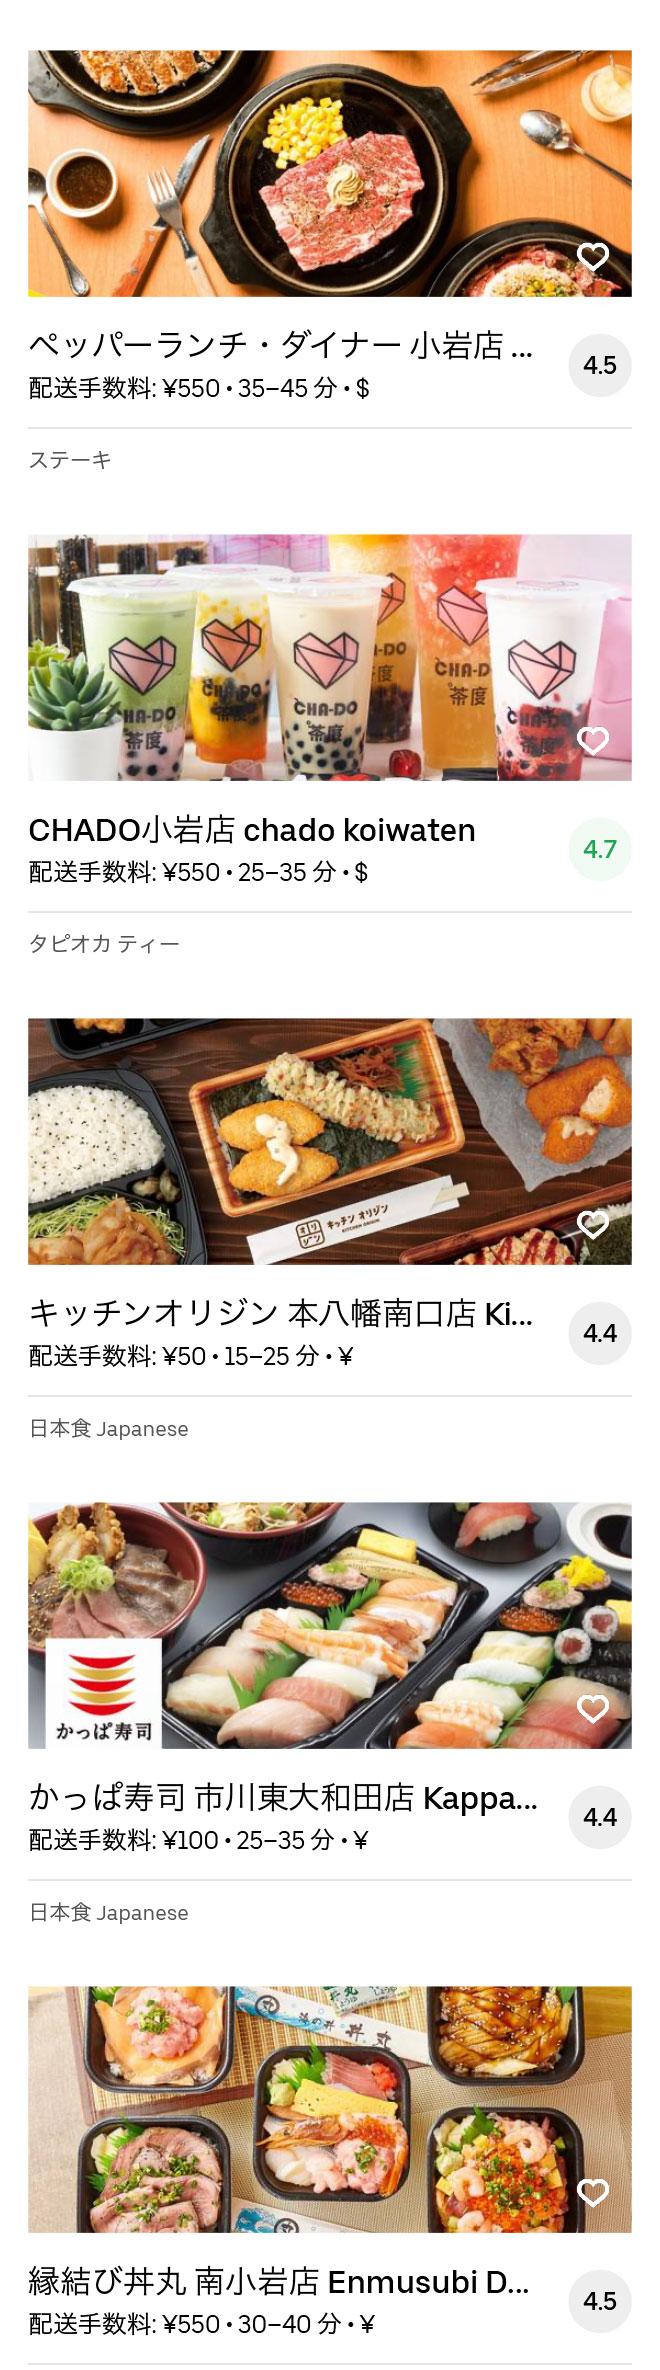 Ichikawa motoyawata menu 2004 07